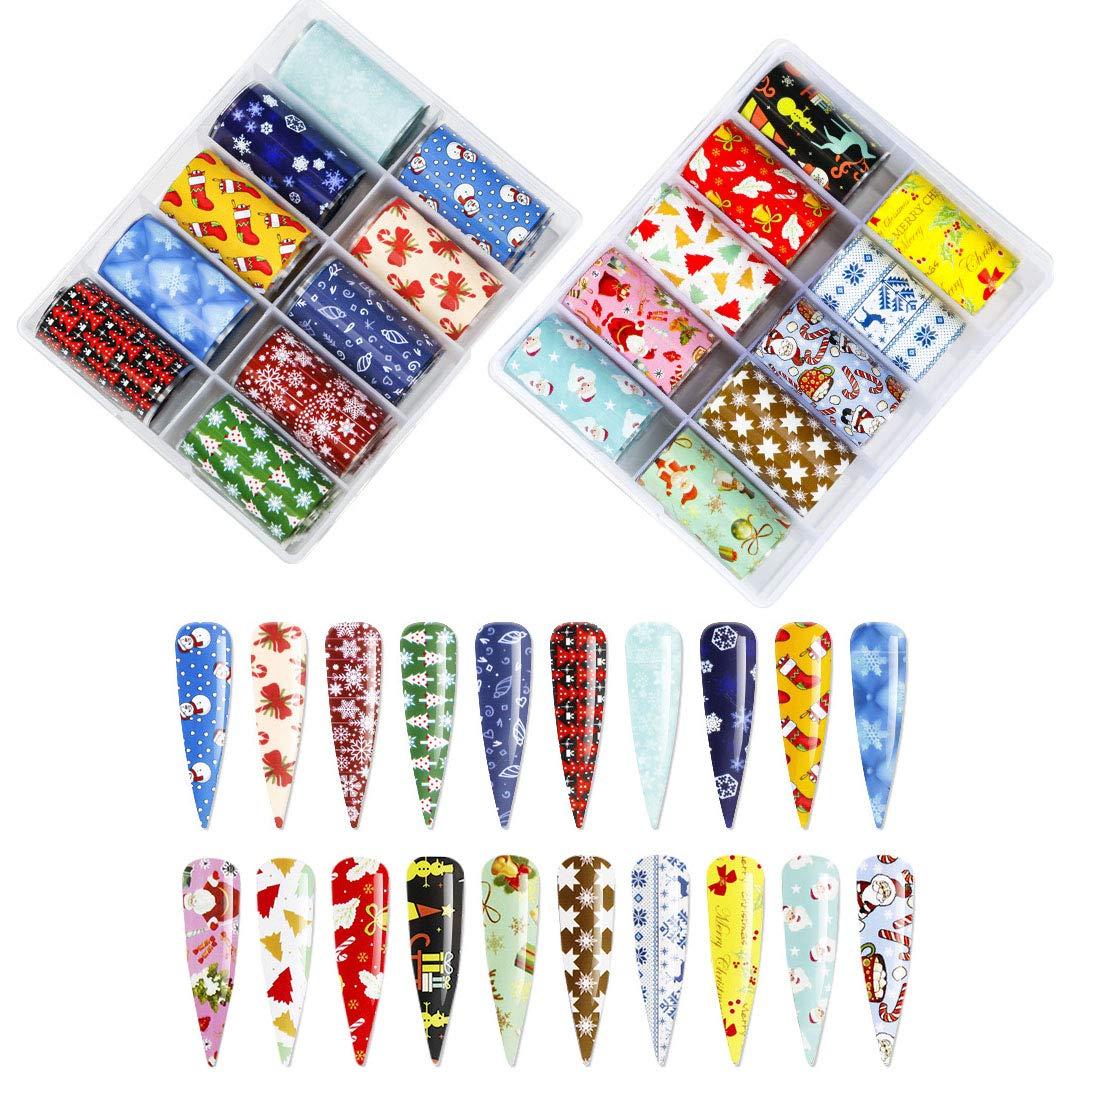 20 Color Fashion Art Nail Foil Transfer Stickers Christmas Holographic Nail Art Stickers Wraps for Women Fingernails and Toenails Decorations